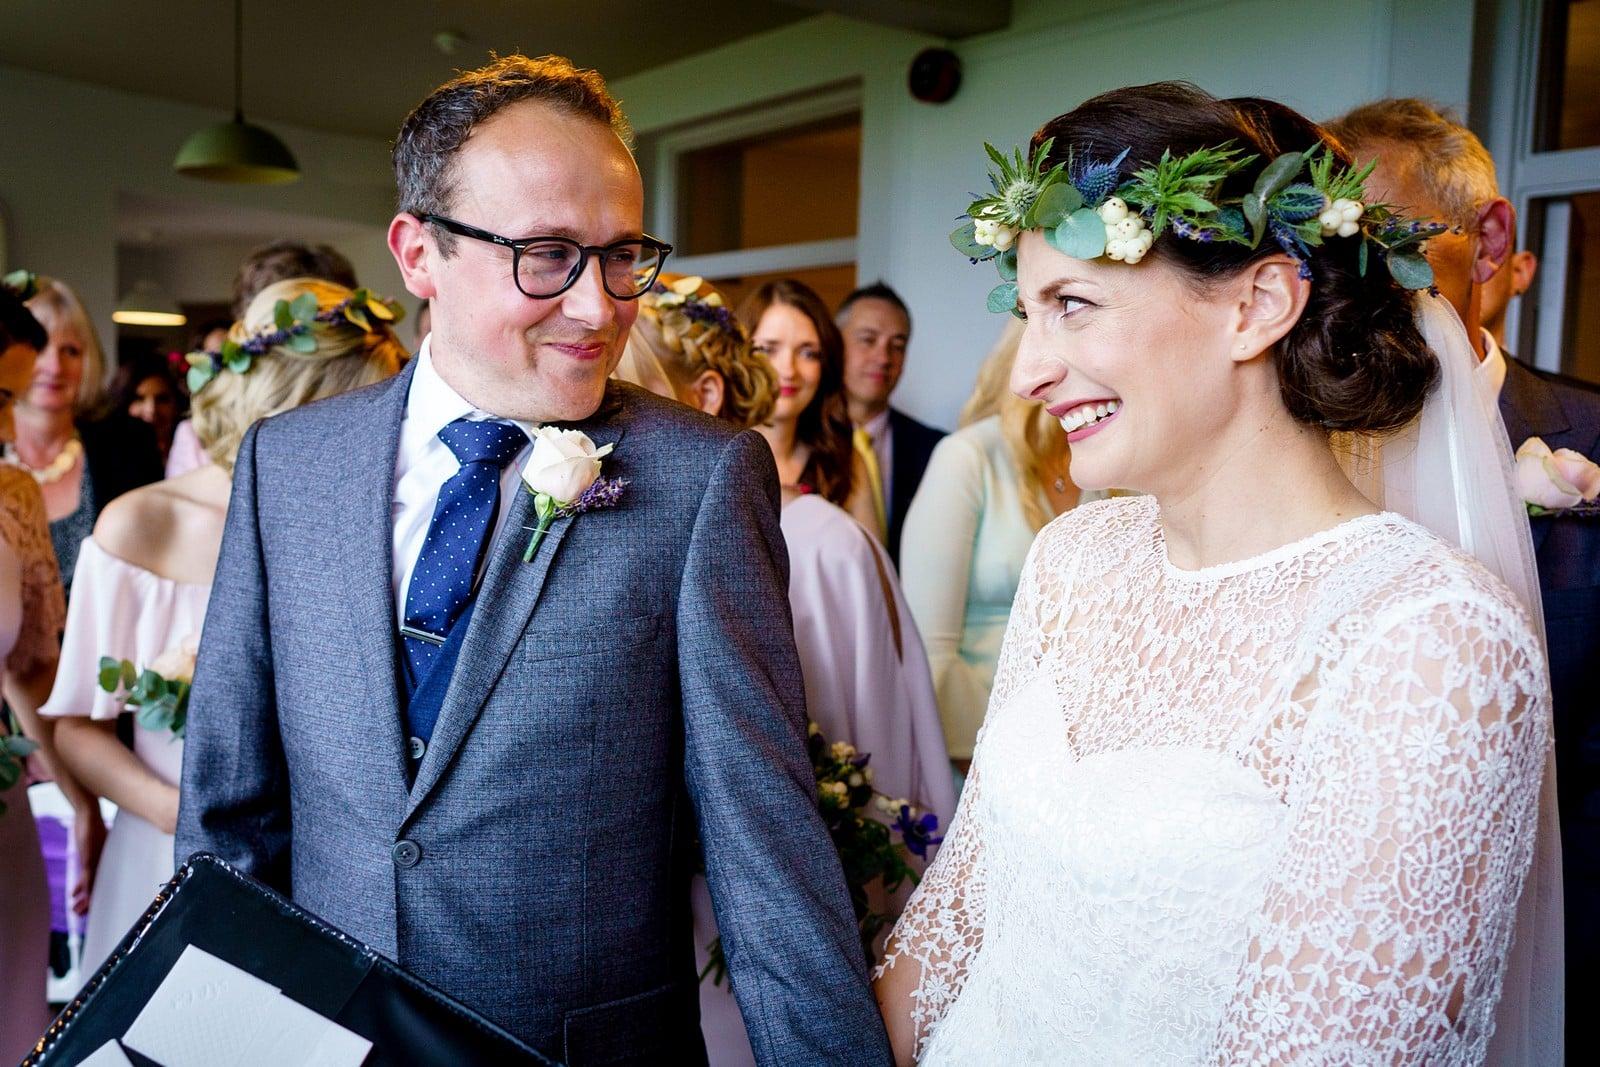 Rosevine hotel wedding ceremony 1